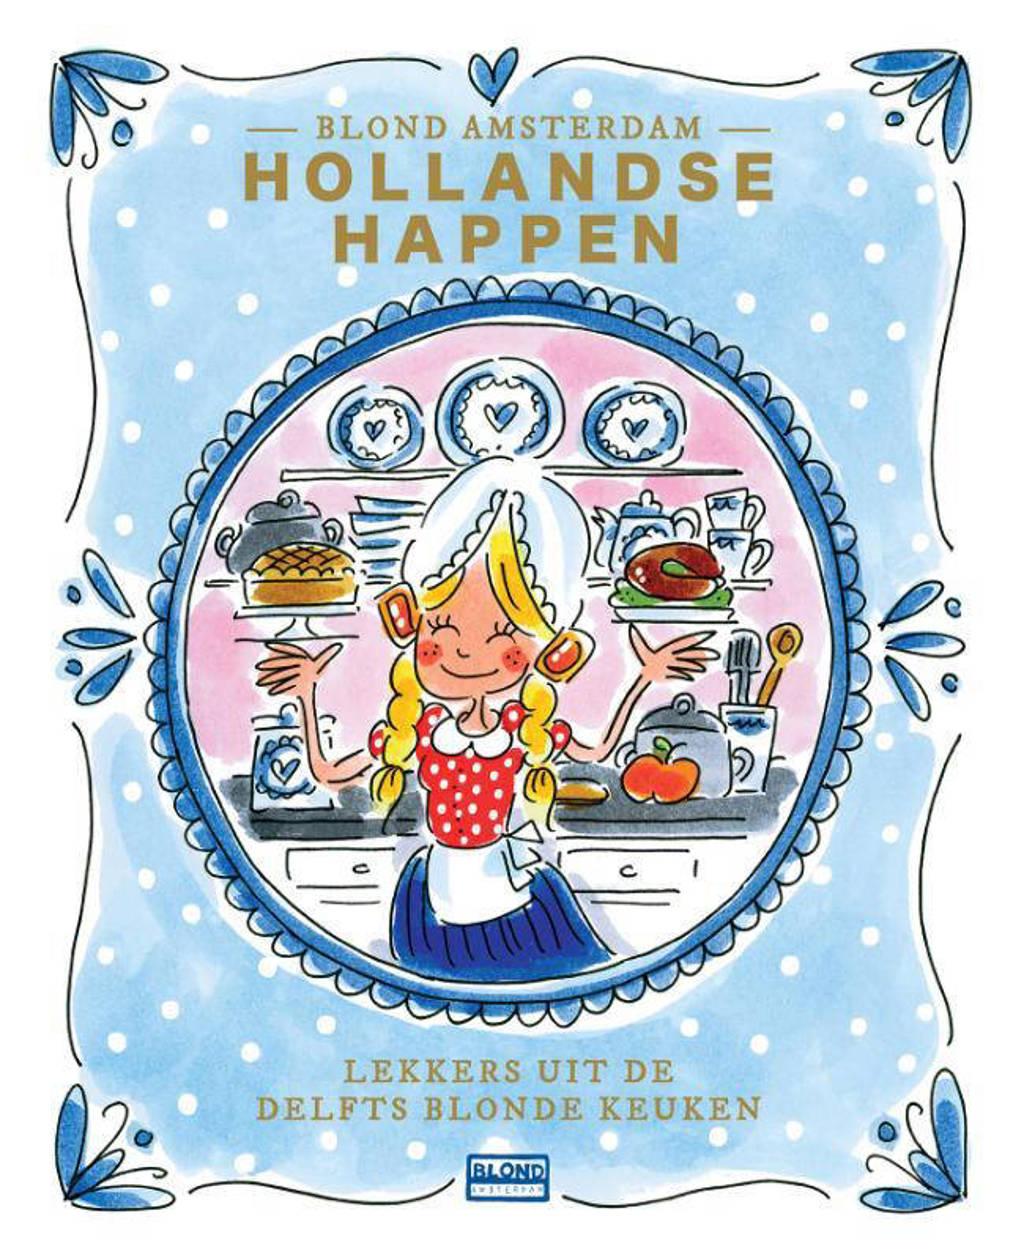 Hollandse happen - Blond Amsterdam